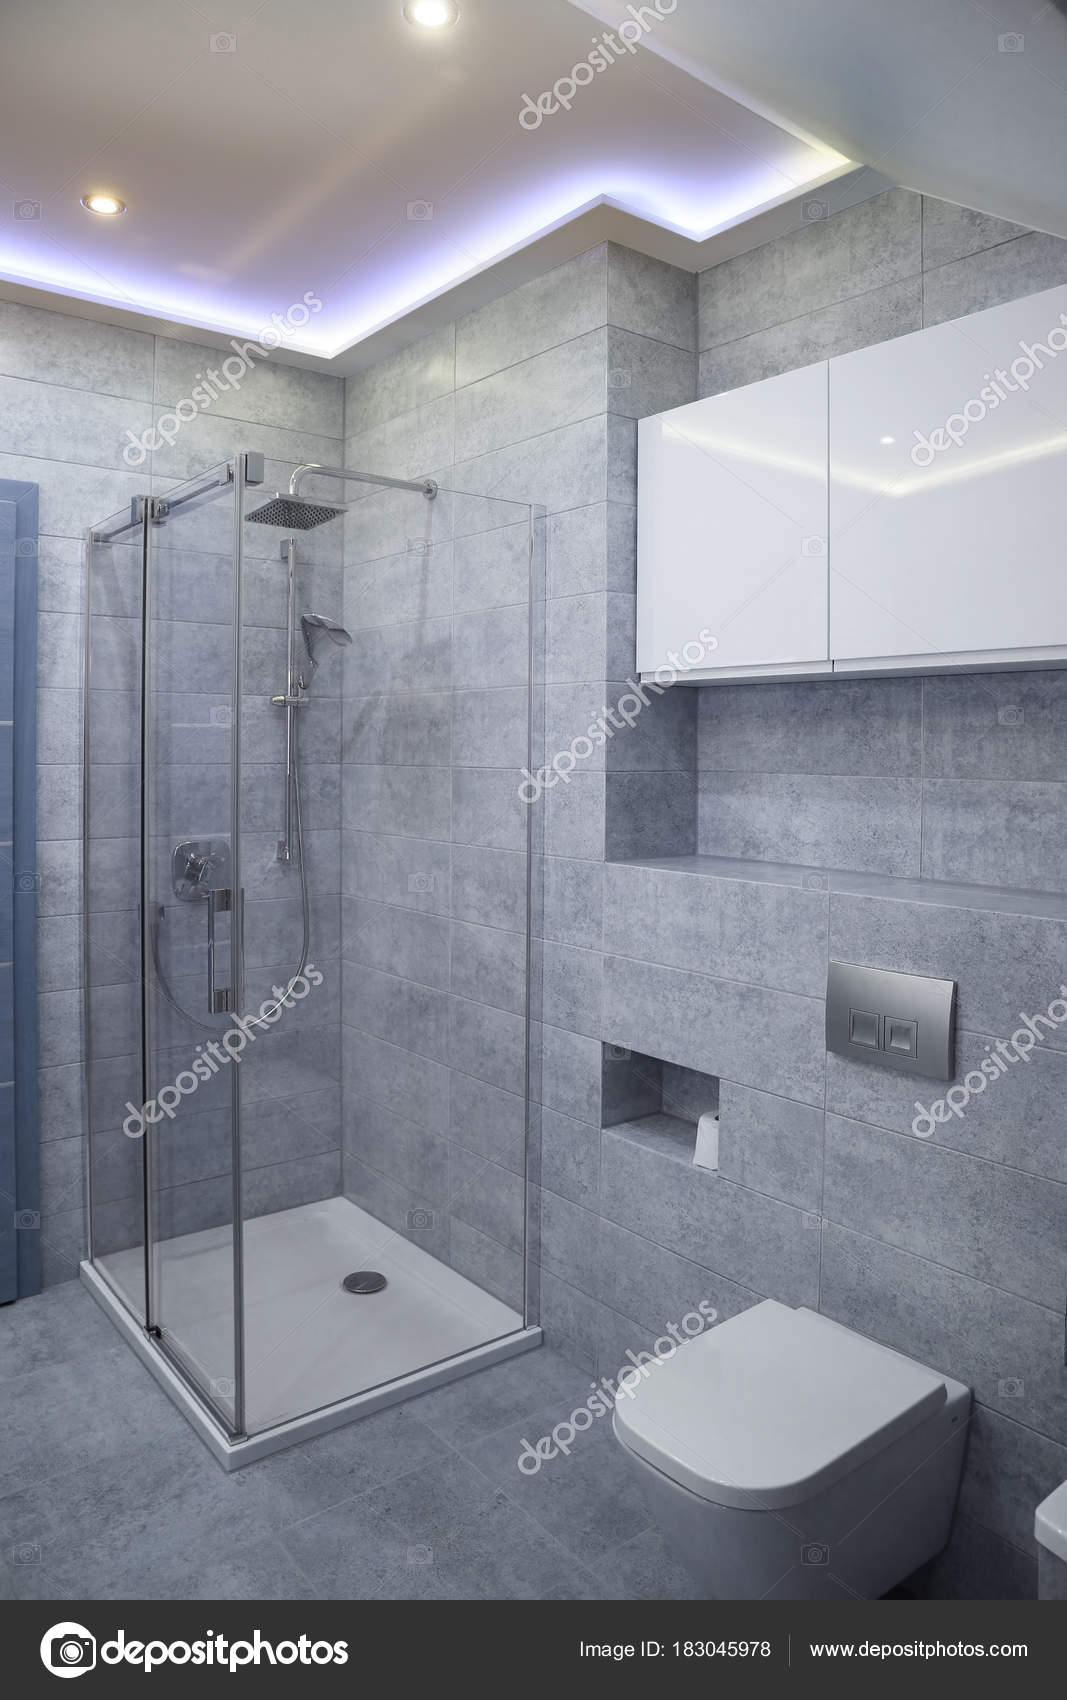 New Bathroom Style Grey Stock Photo, New Bathroom Style